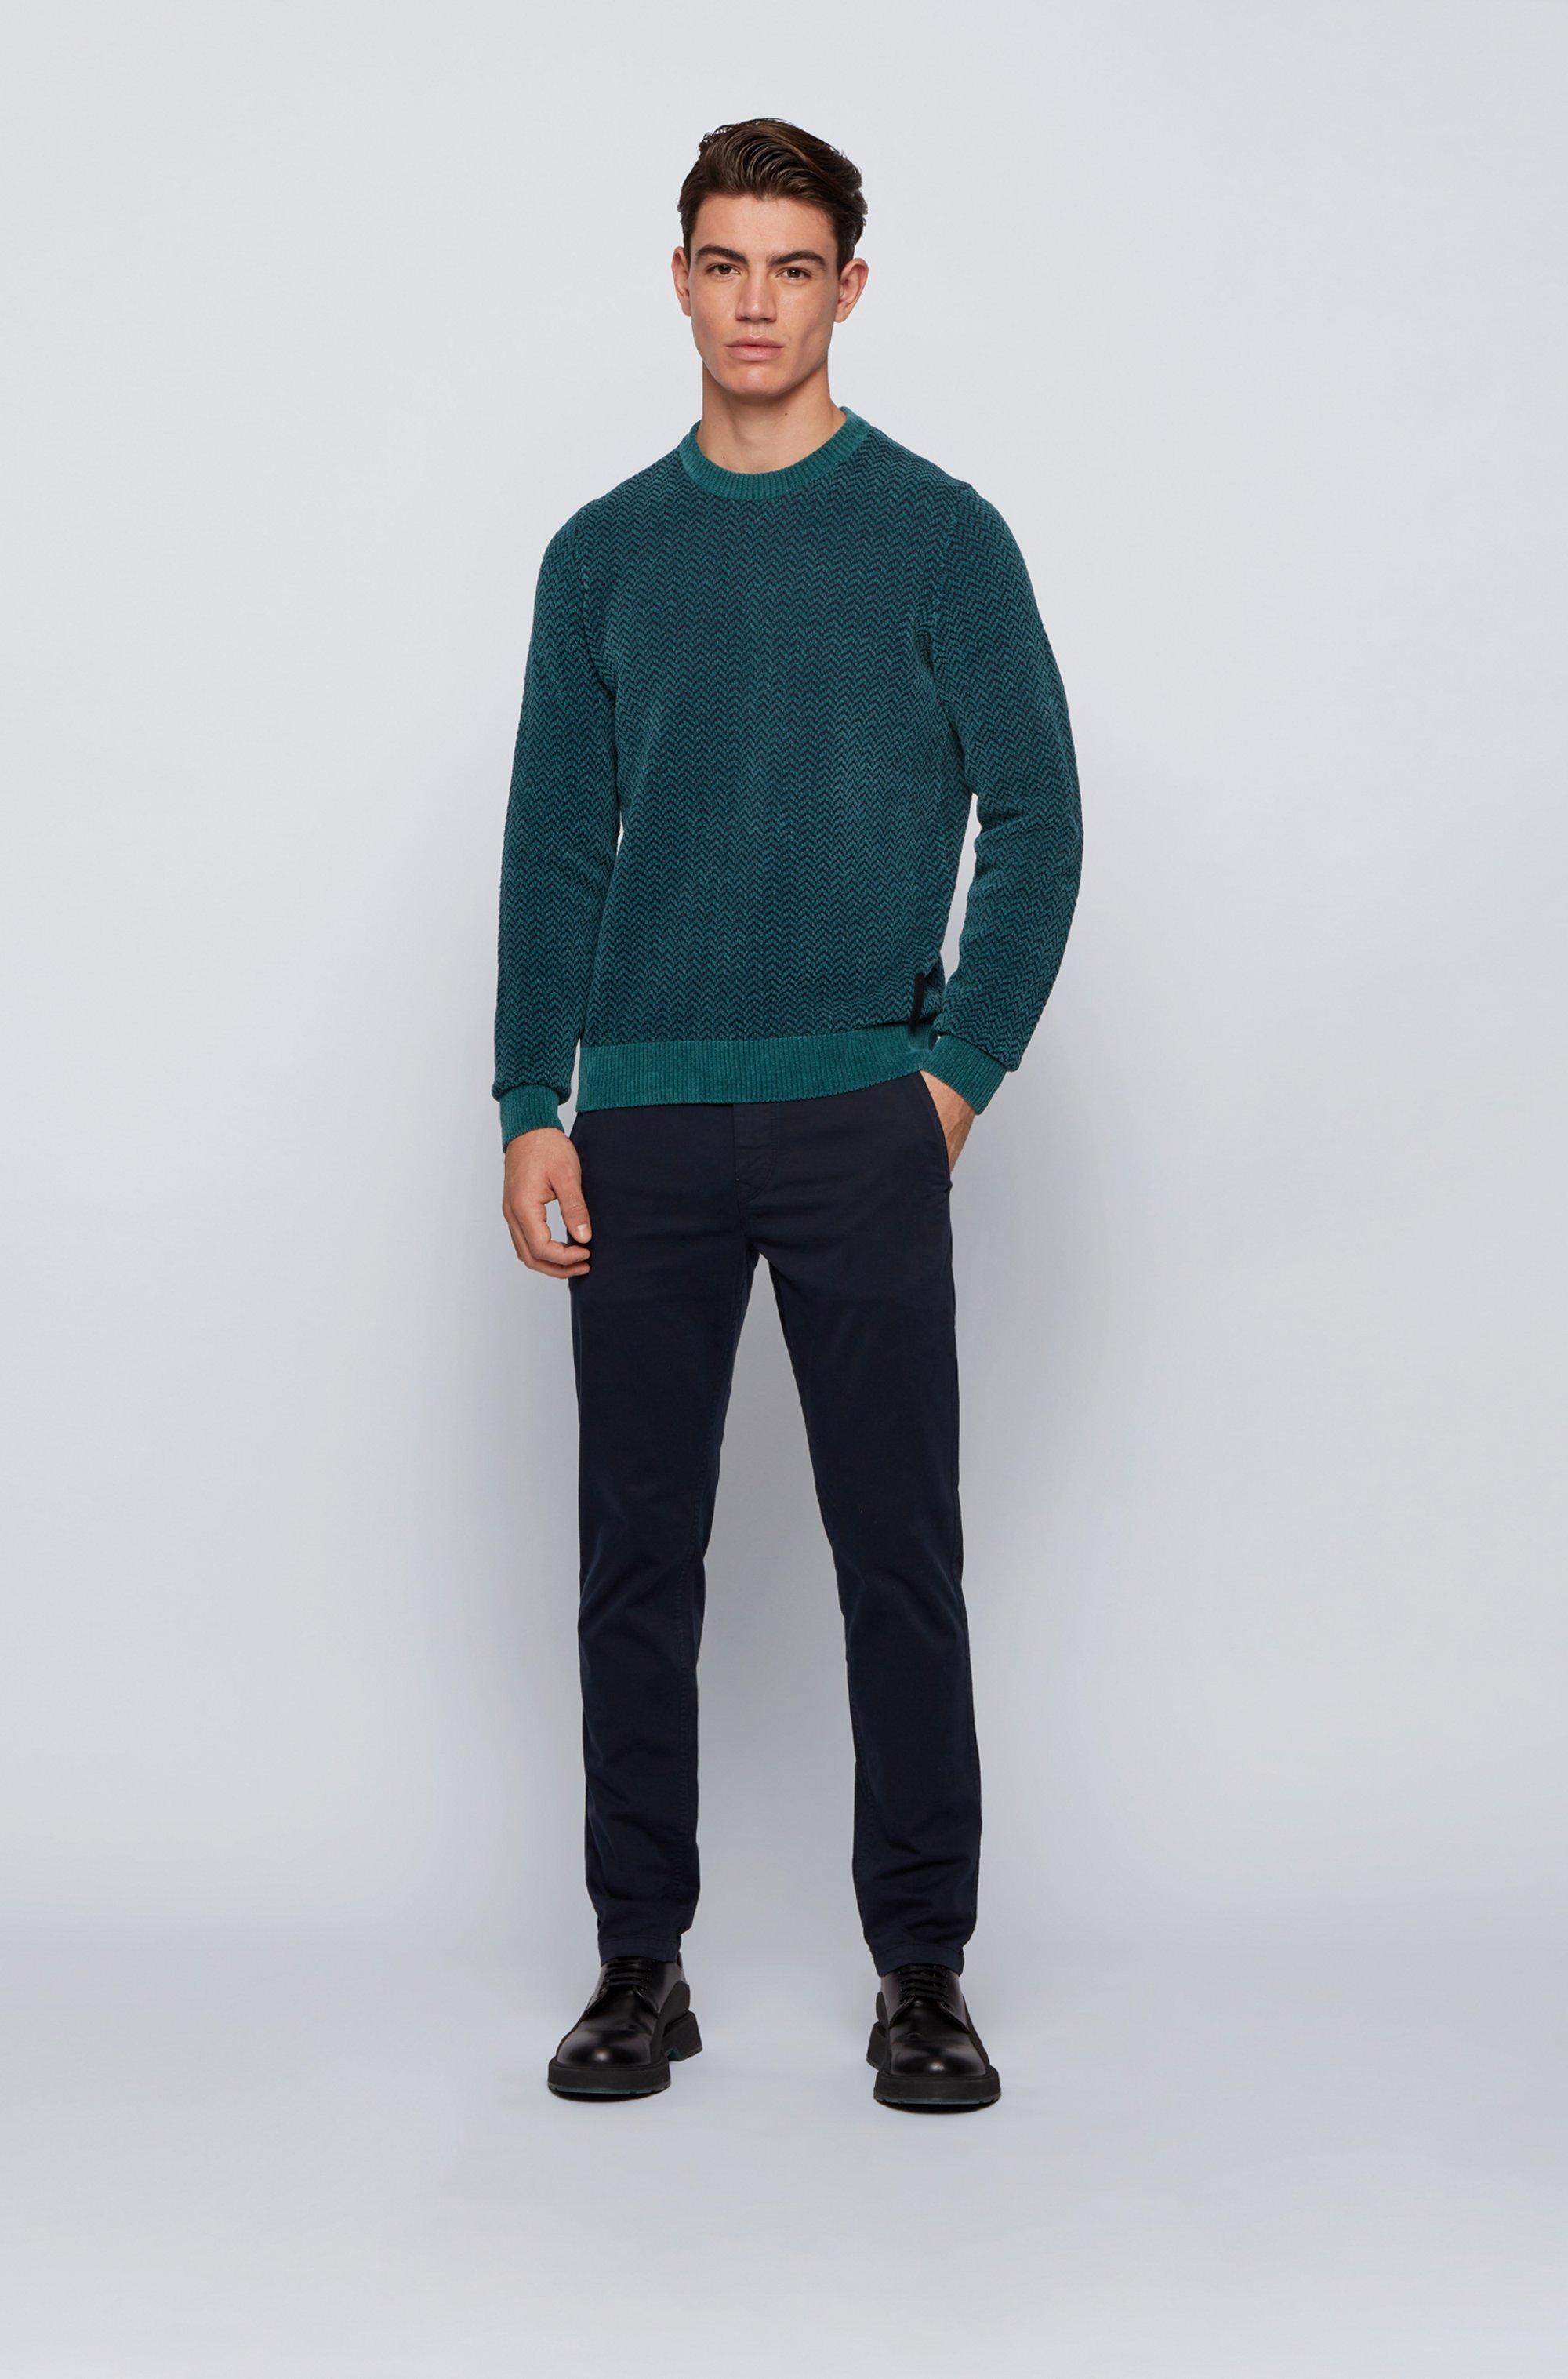 Herringbone-patterned sweater in cotton-blend chenille